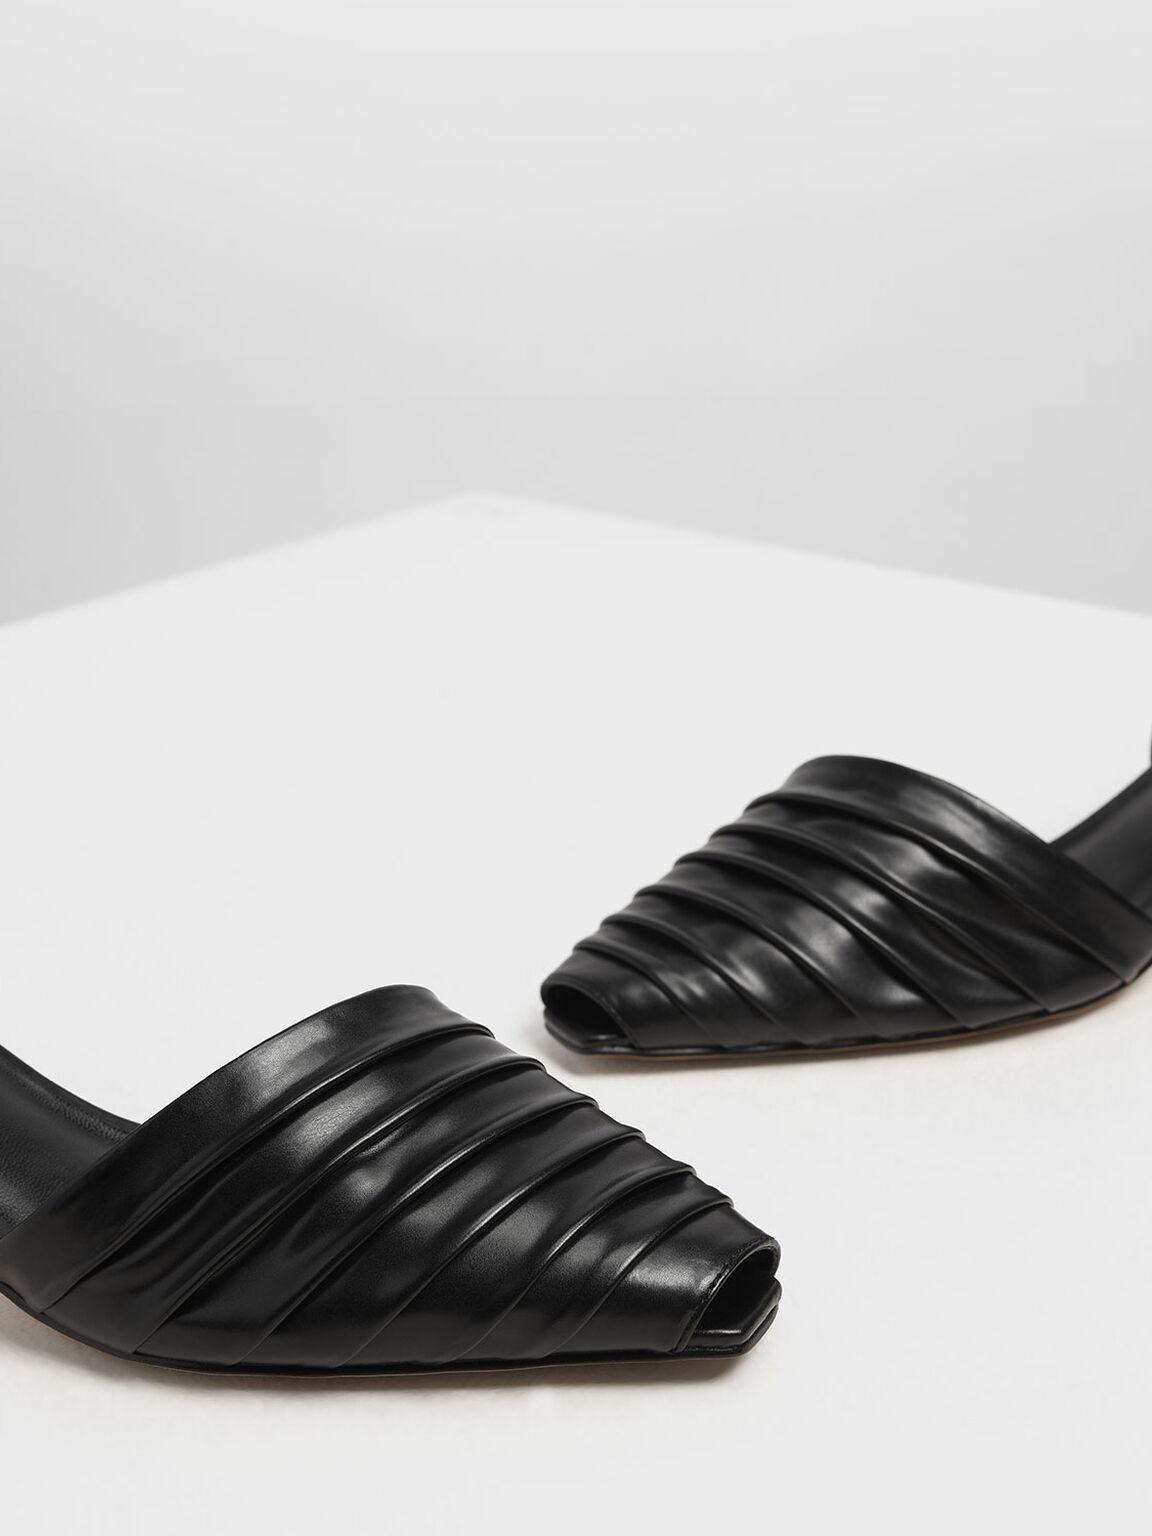 Ruched Peep Toe Slingback Heels, Black, hi-res